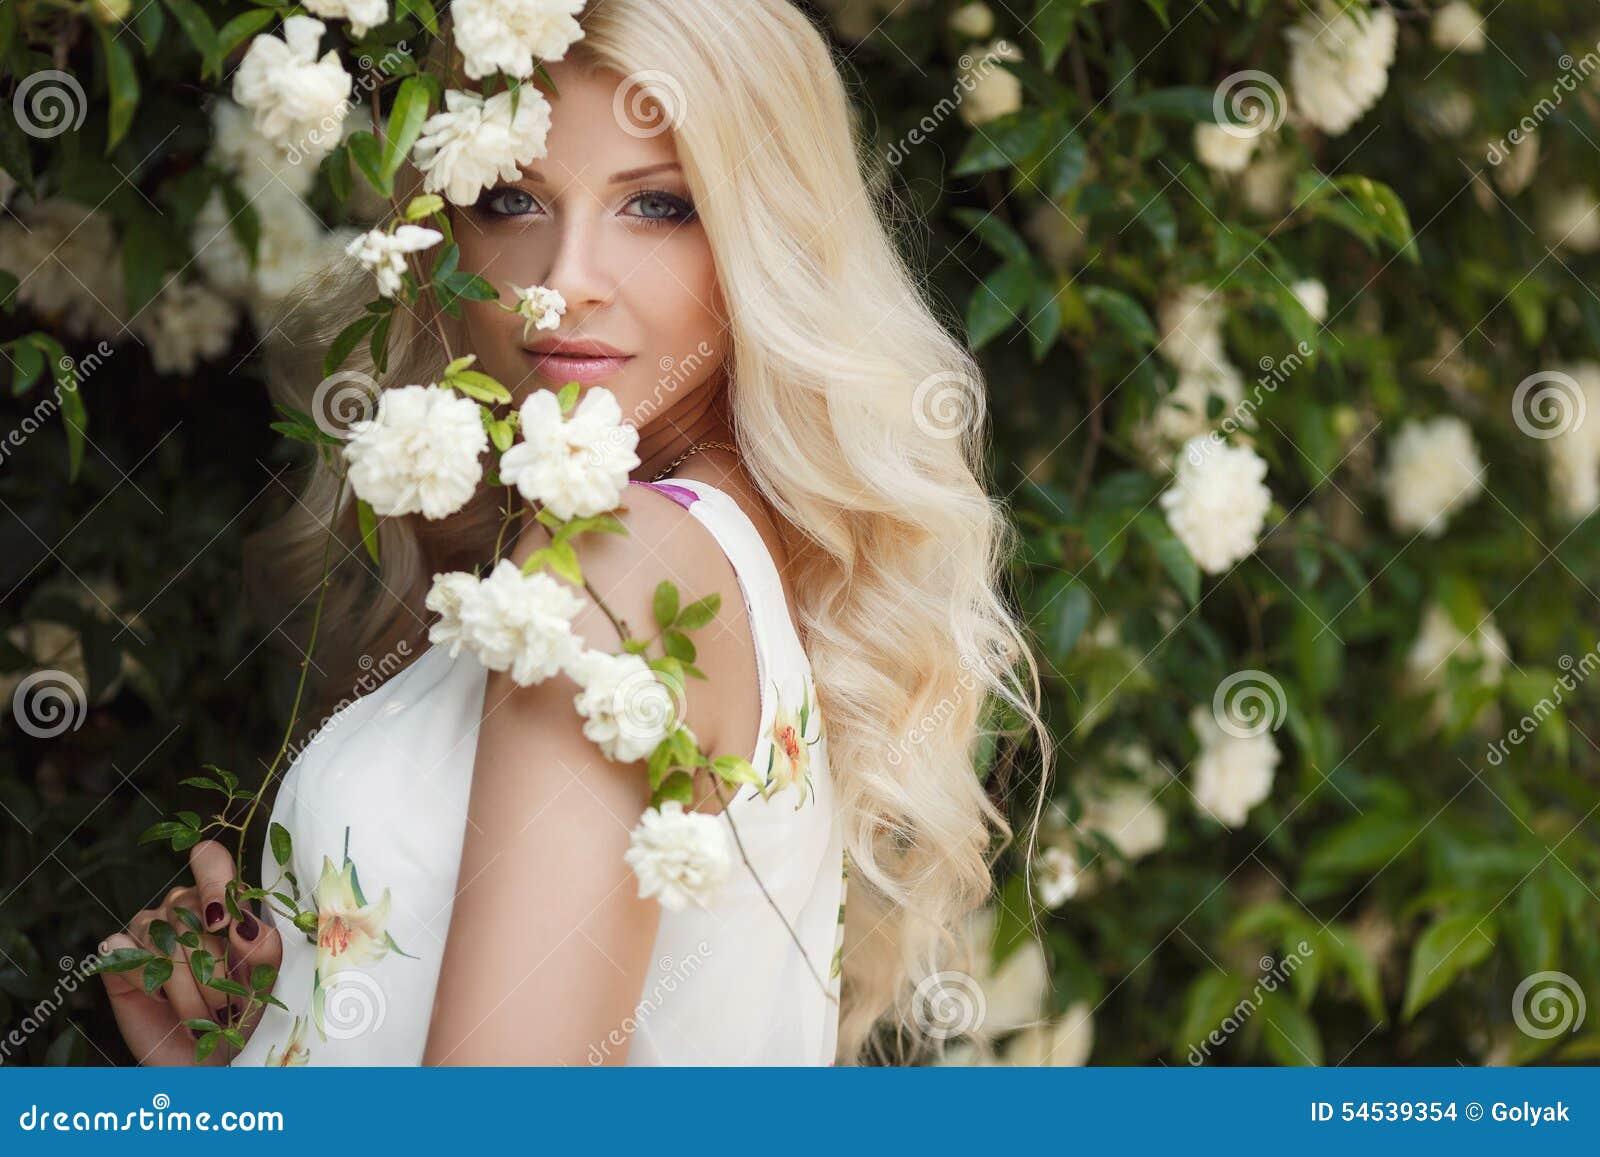 Beautiful woman in Park near the Bush blooming roses